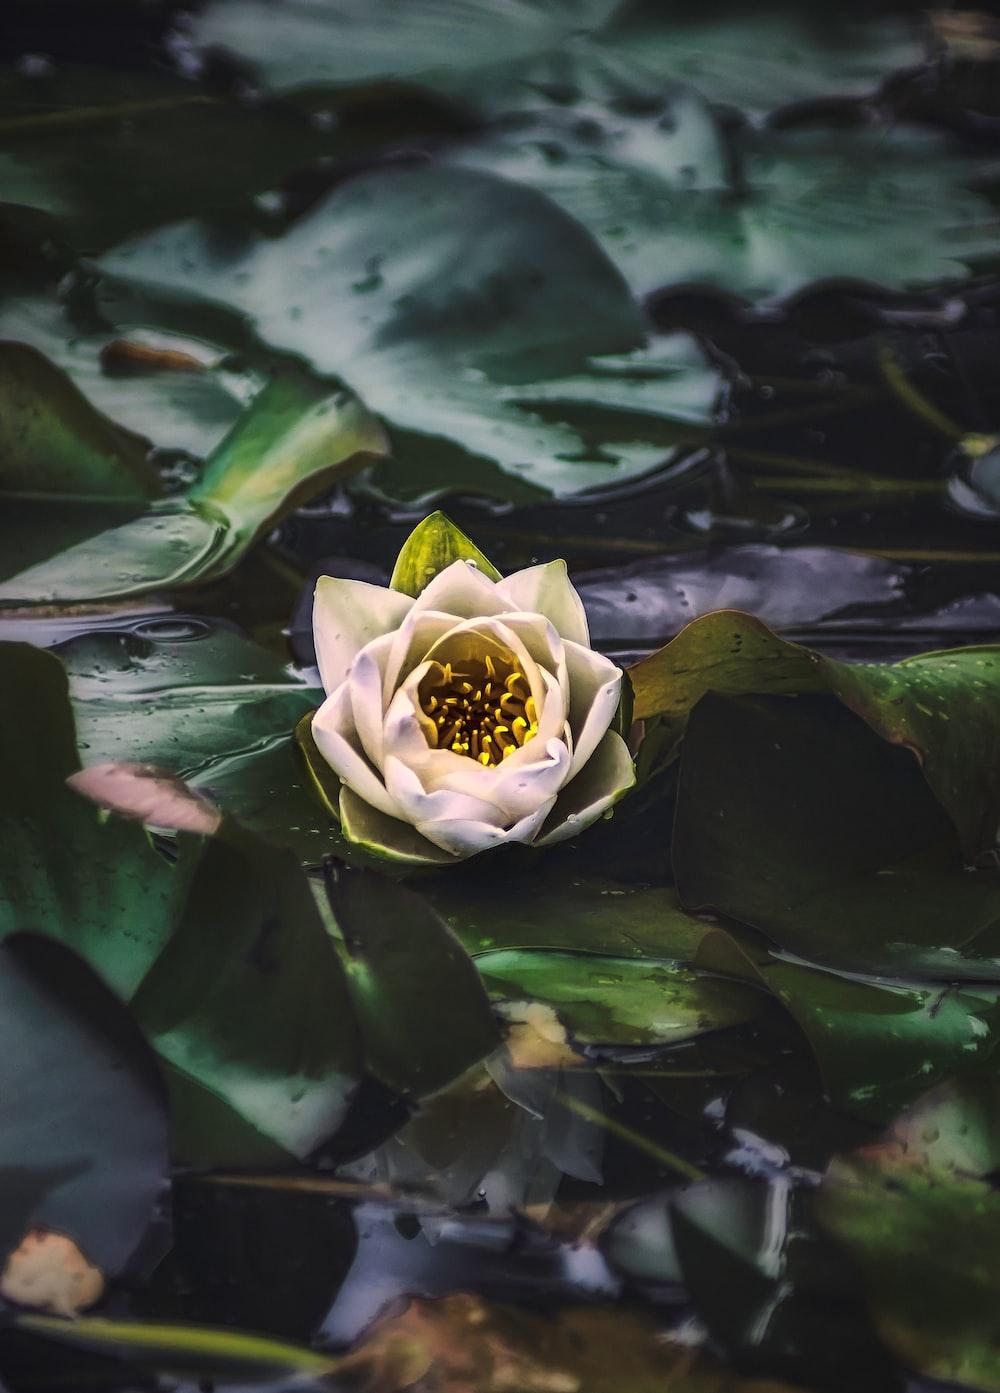 green lotus flower on water